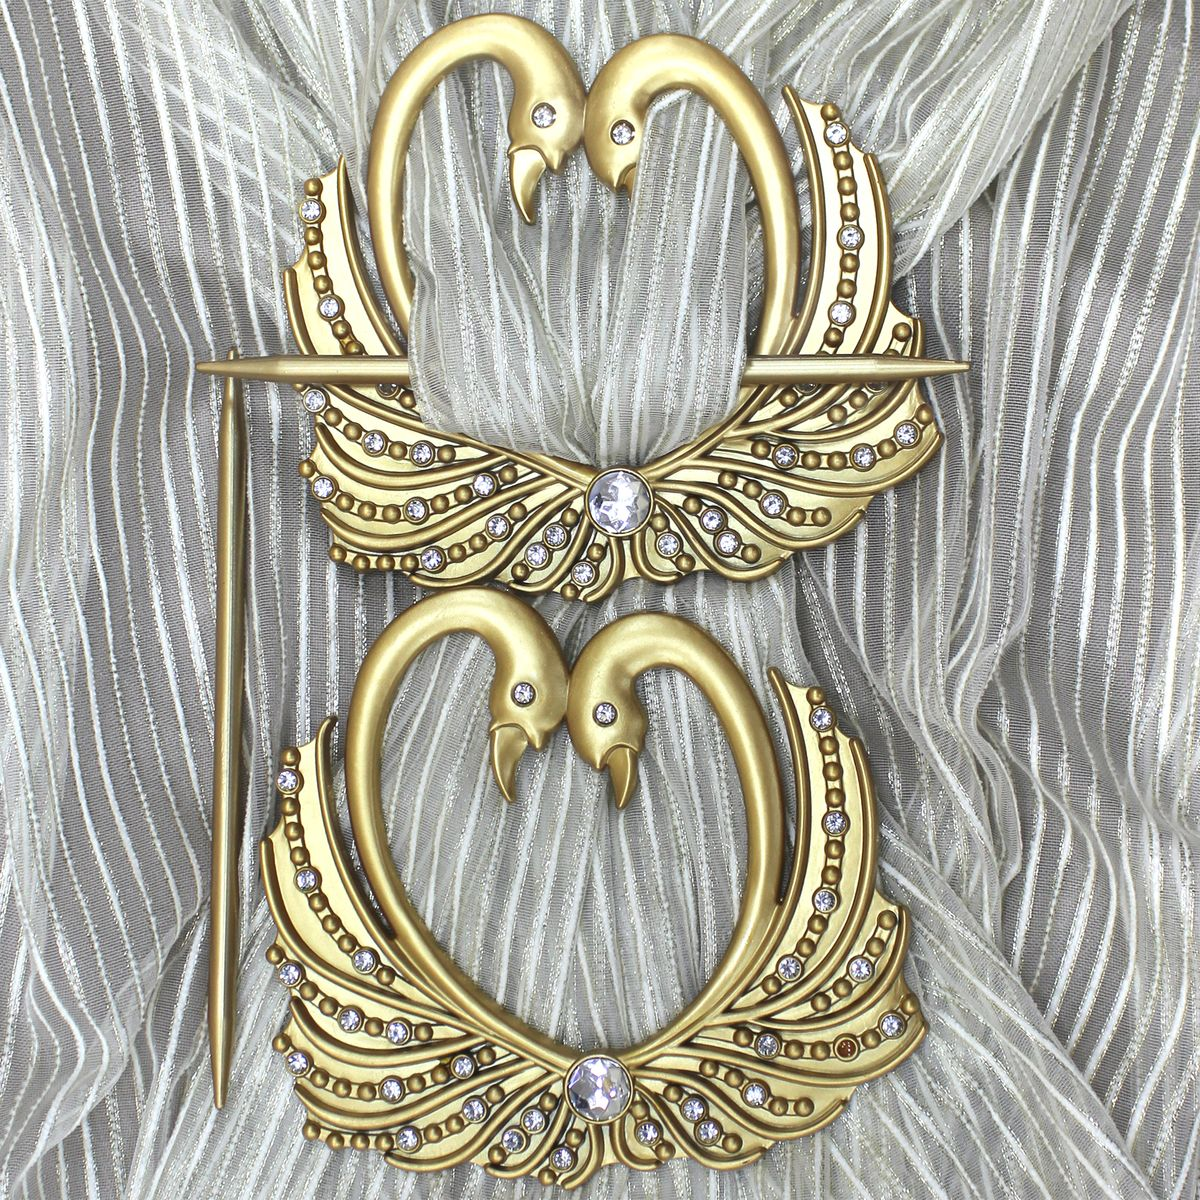 Заколка для штор TexRepublic Lebedi, цвет: золотистый, 2 шт. MI C8-2 цена